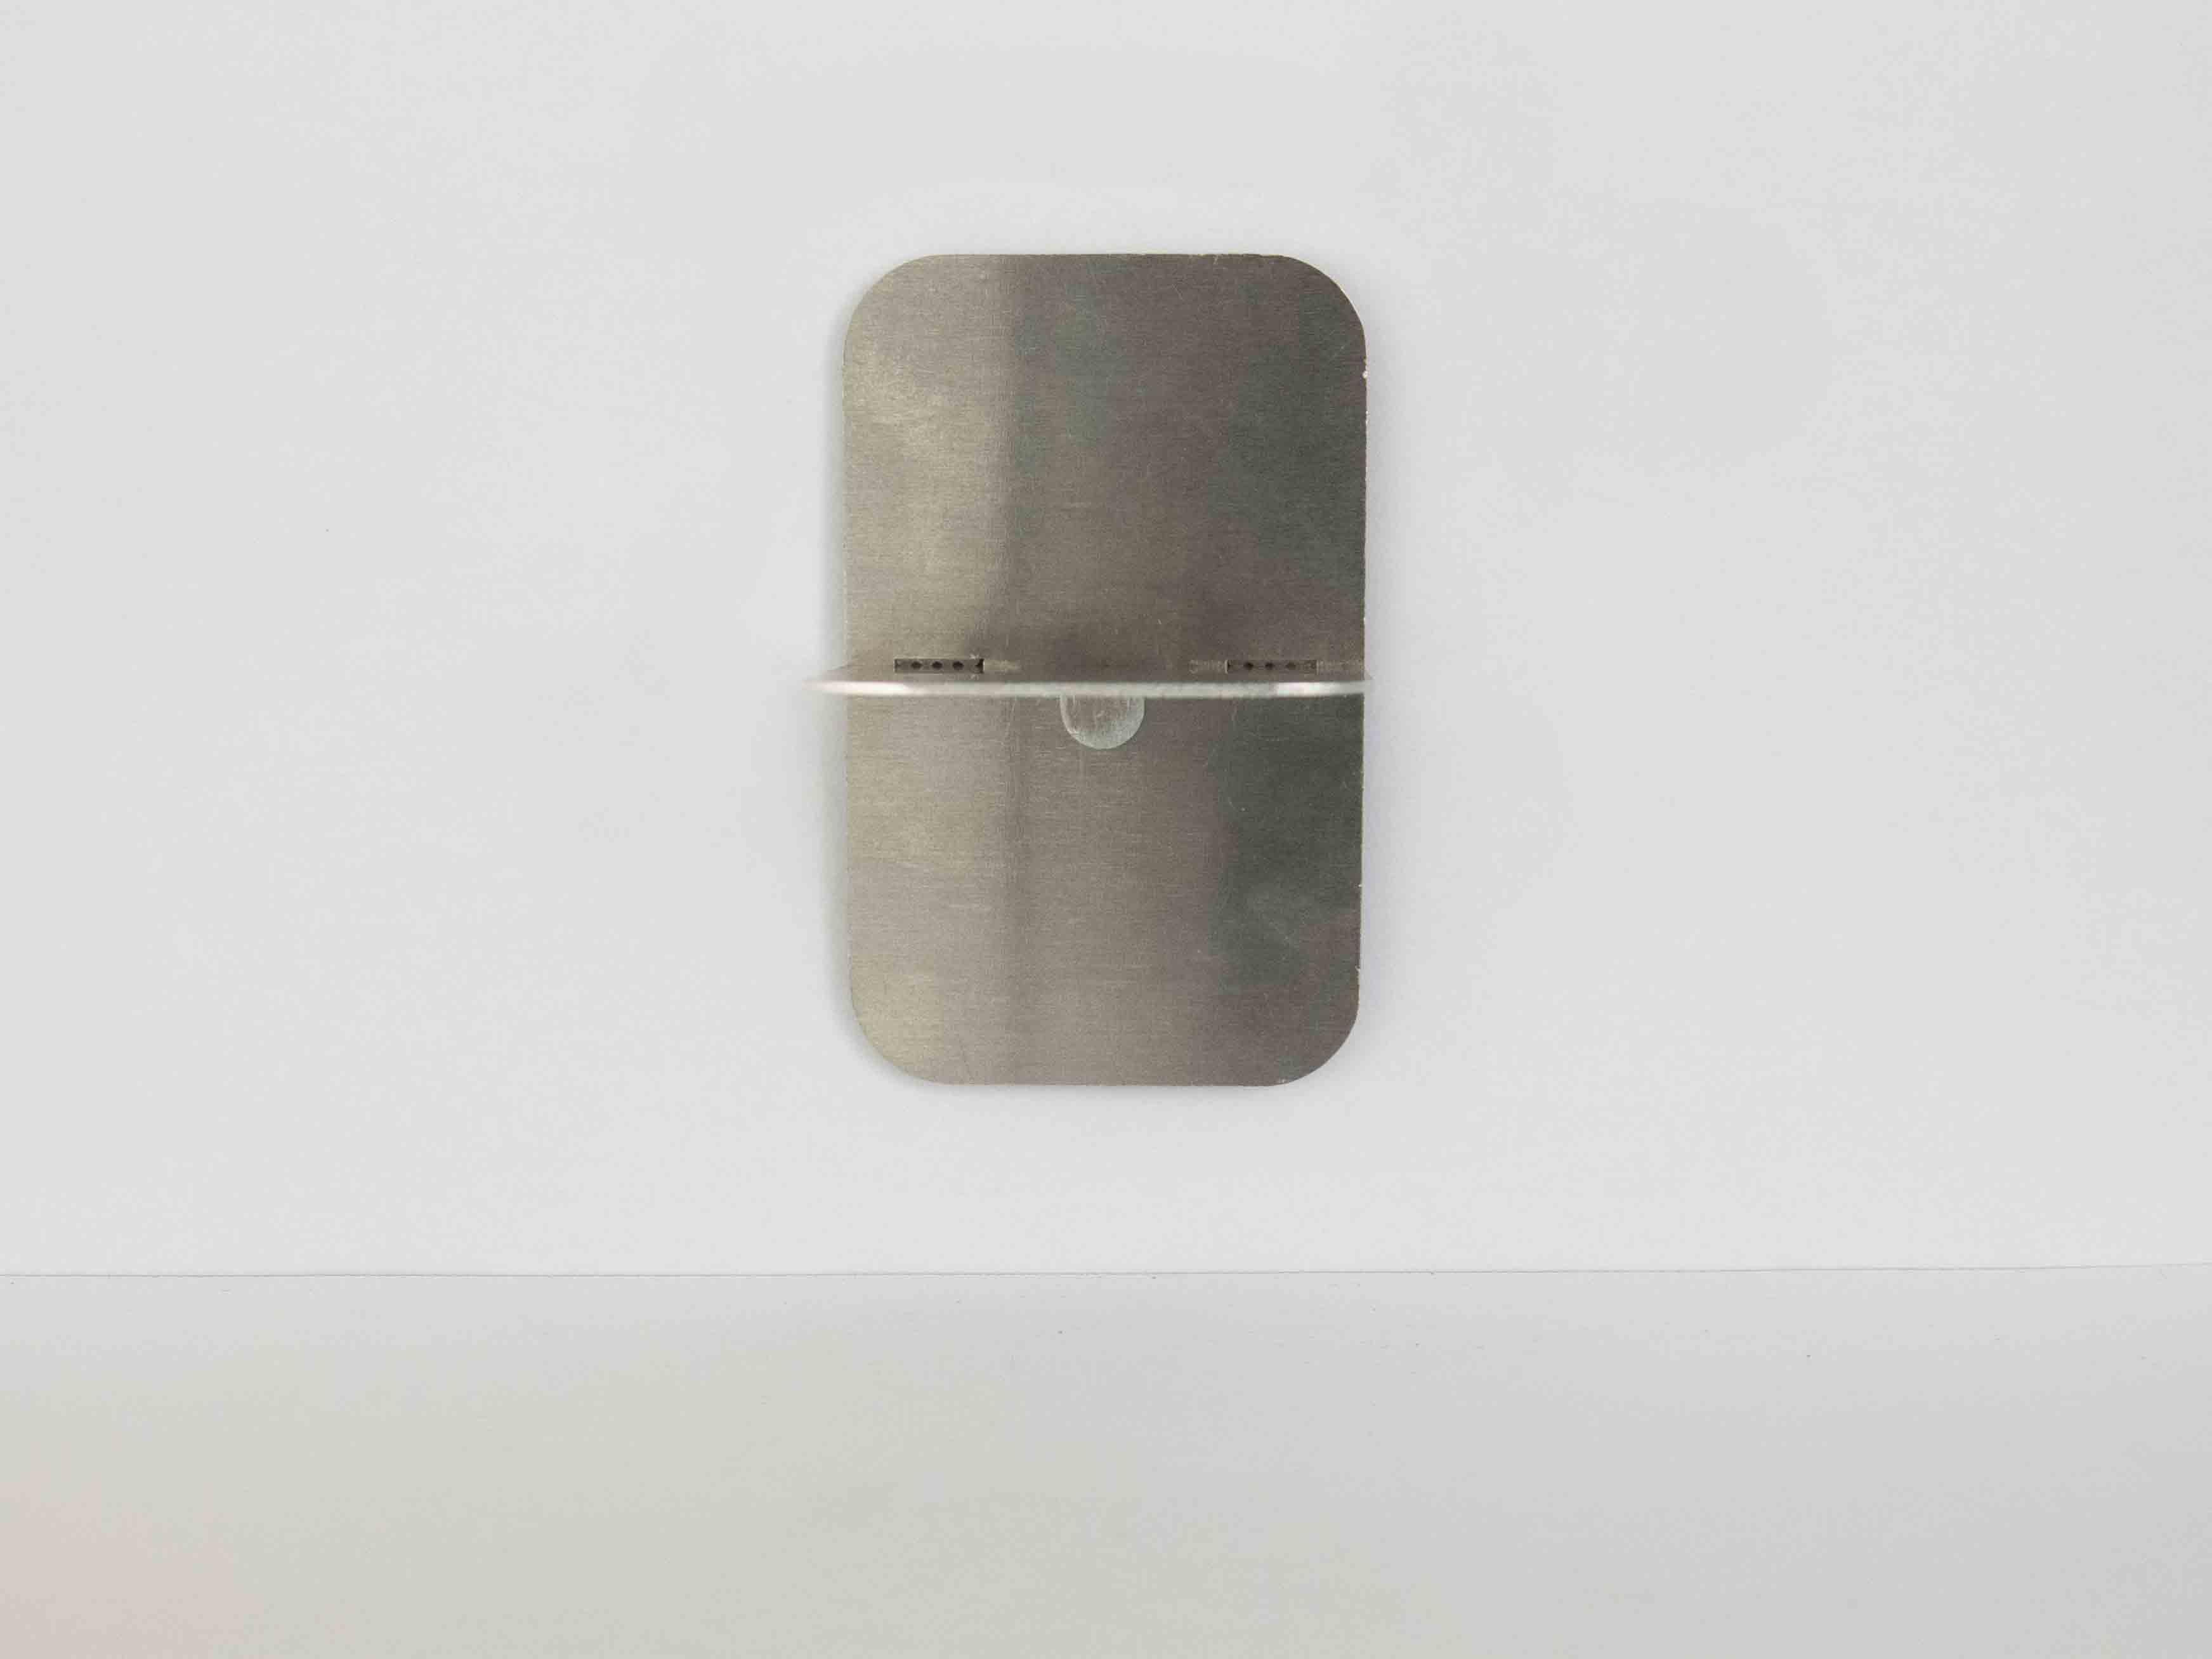 Laser cut metal fastening perpendicular clipsing on wall